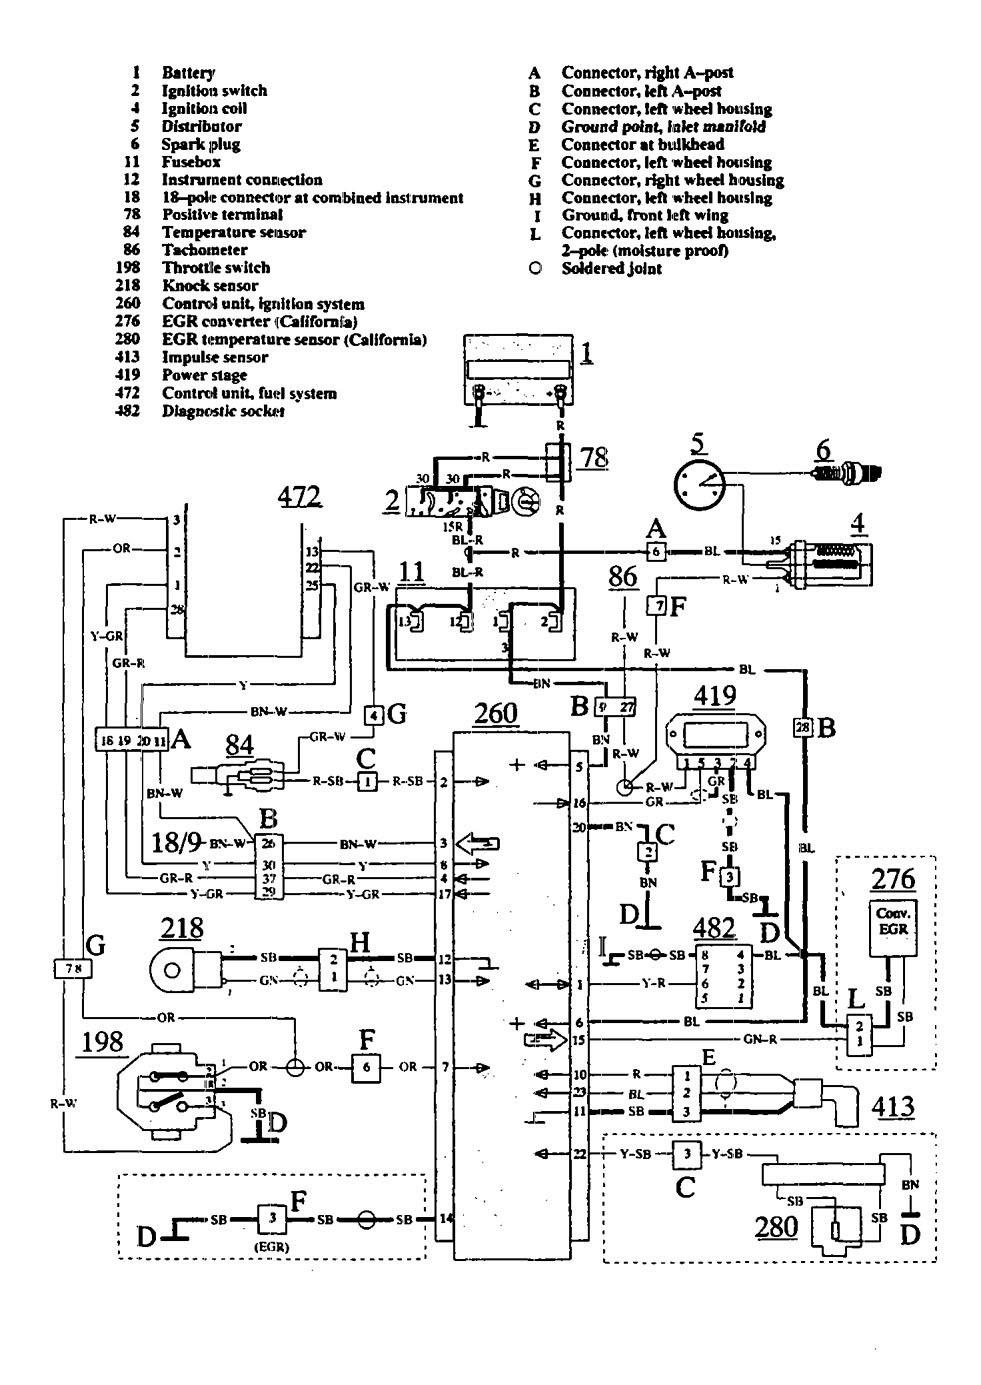 Diagram Asco 940 Wiring Diagram Full Version Hd Quality Wiring Diagram Shock One Weblula It